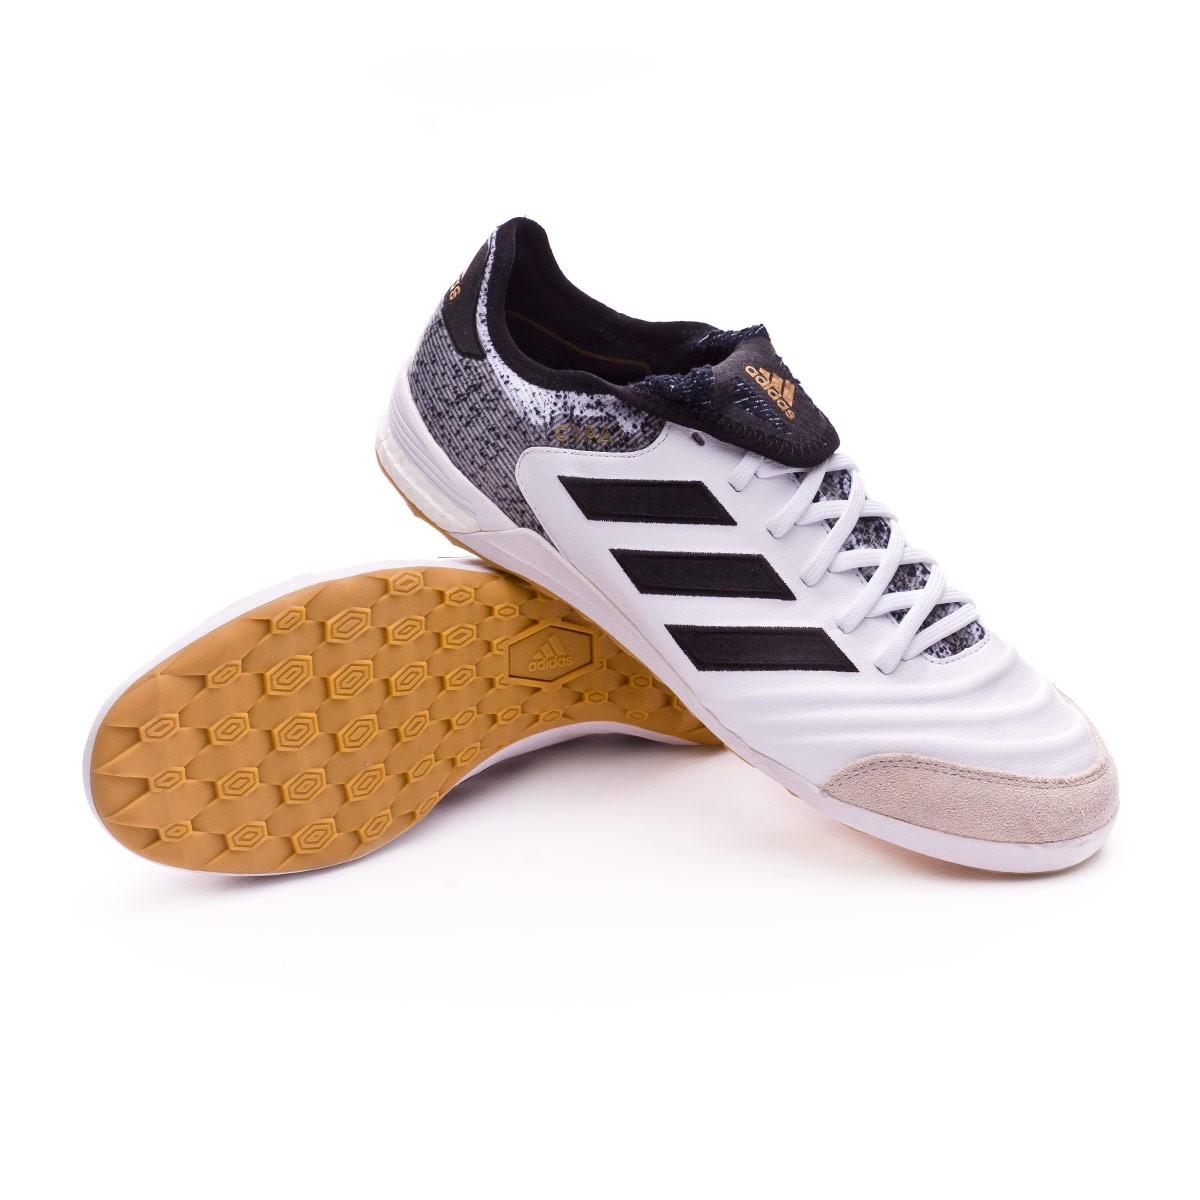 Futsal Boot adidas Copa Tango 18.1 IN White-Core black-Tactile gold ... af907e248